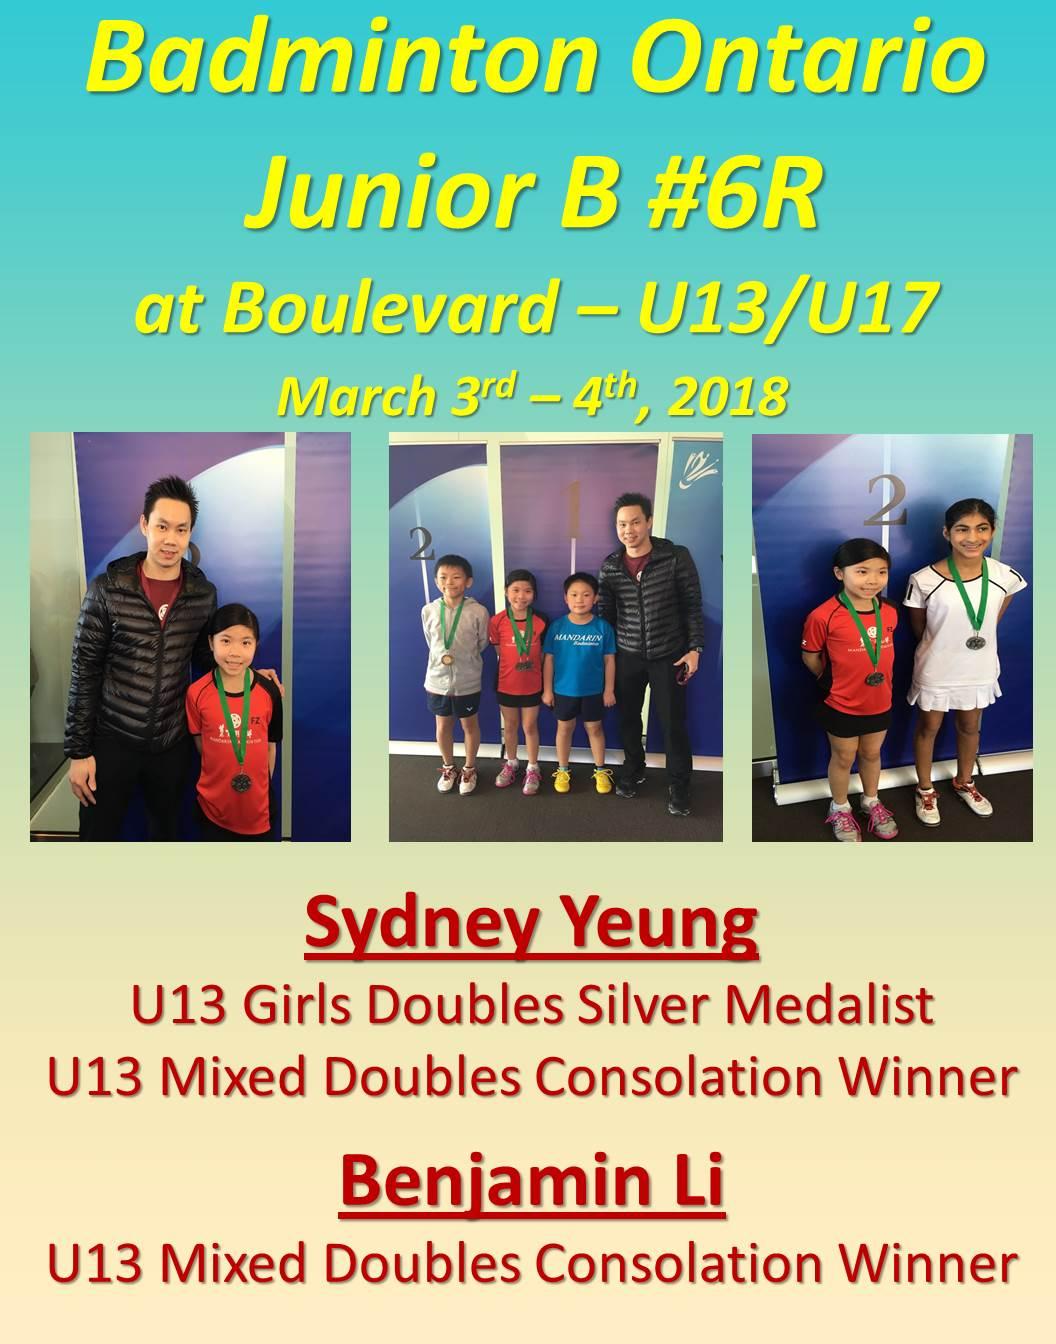 Ontario Jr B #6 Boulevard Mar 3-4, 2018